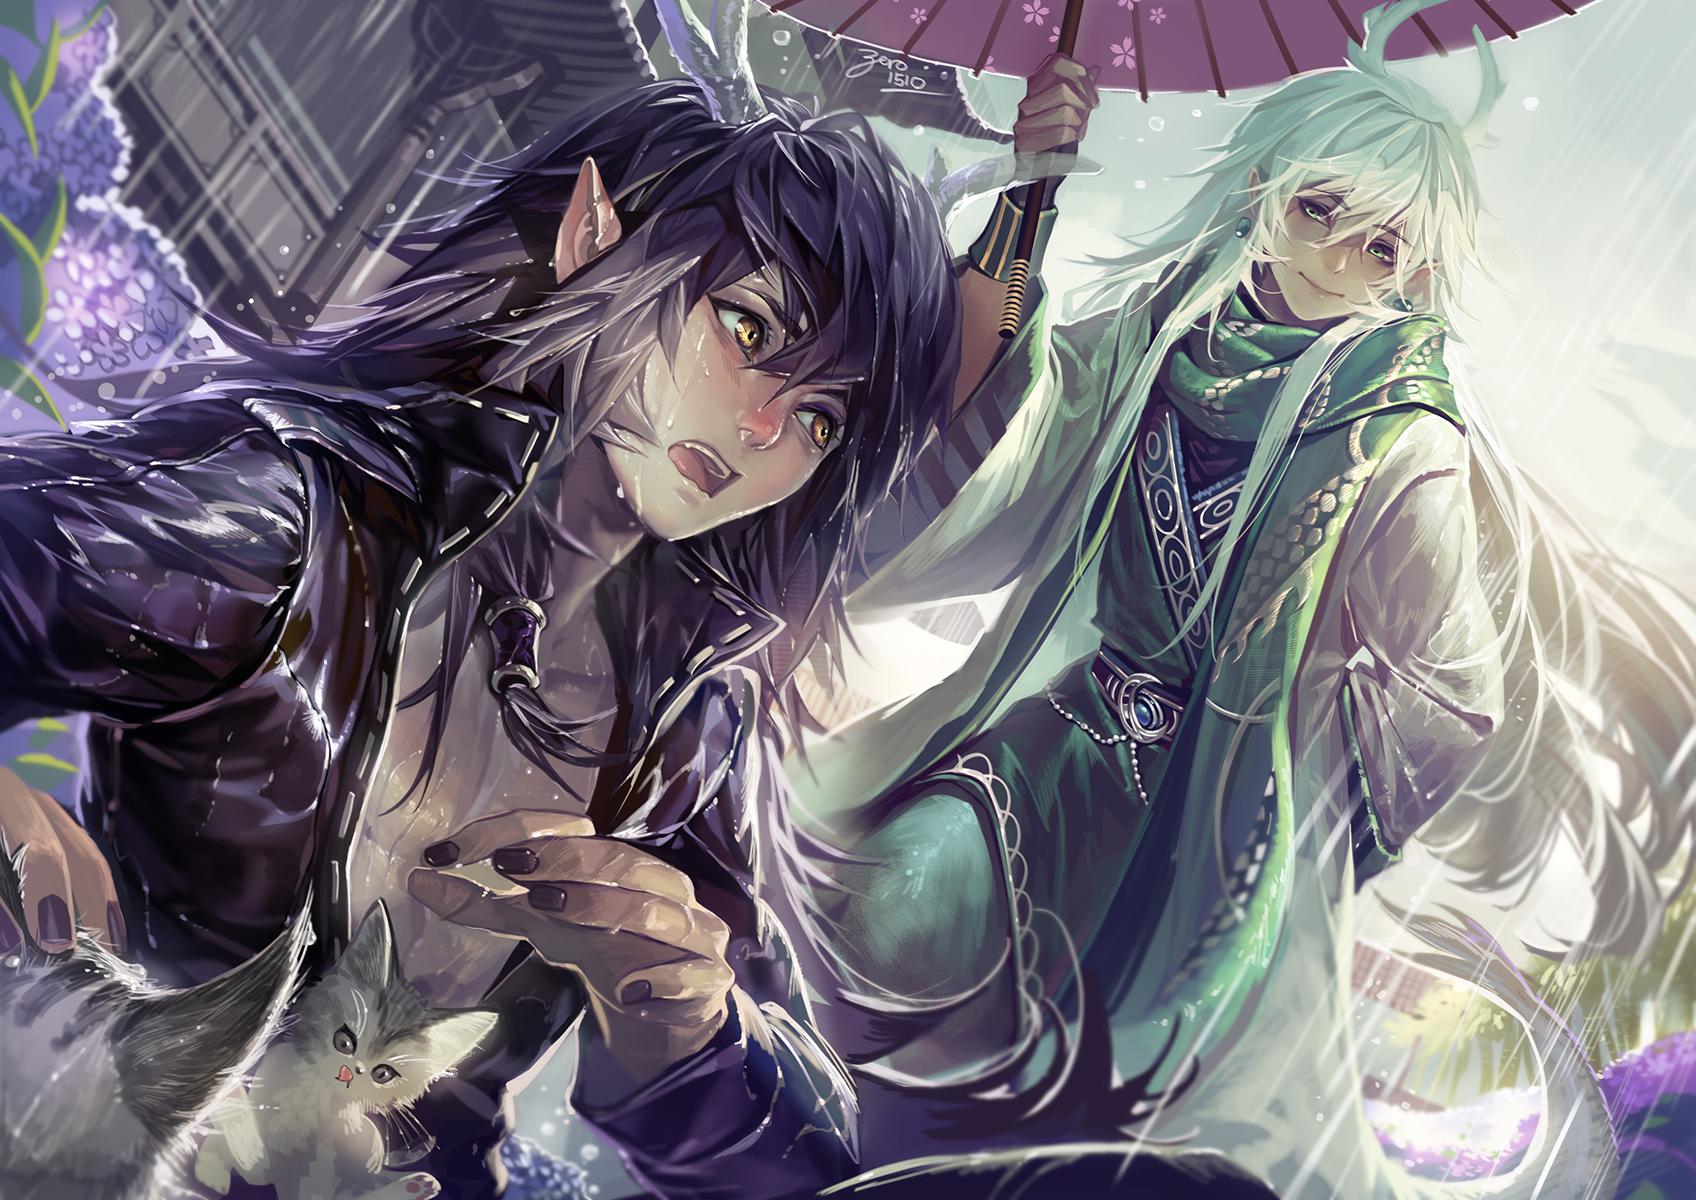 Rainy day by AkiZero1510